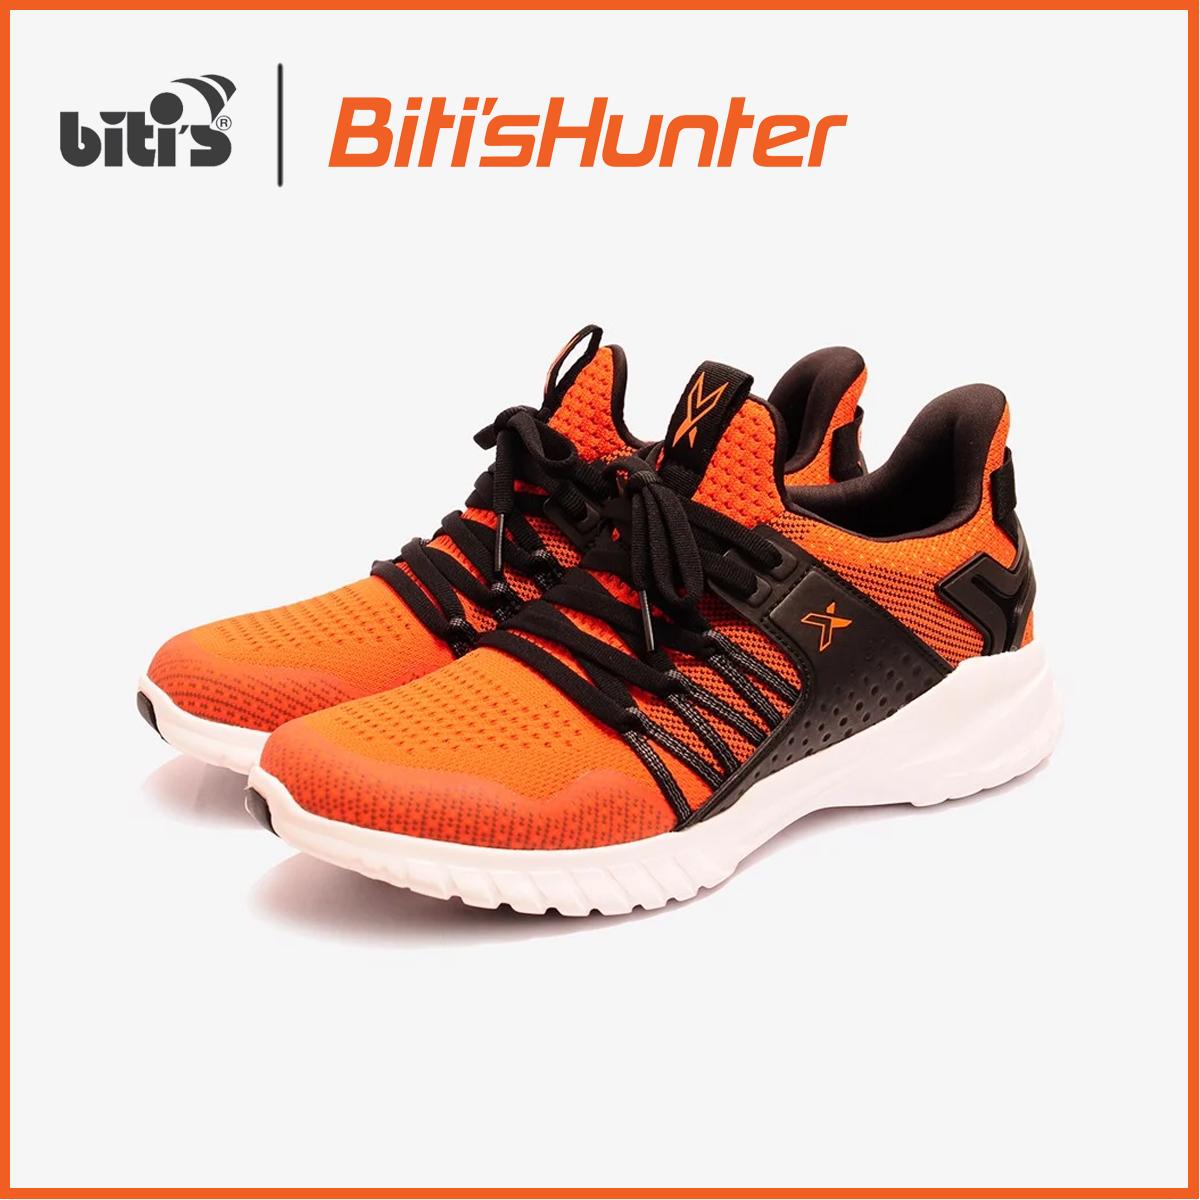 Giày Thể Thao Cao Cấp Nam Biti's Hunter X - Summer 2K19 ADVENTURE COLLECTION - DSMH01100CAM